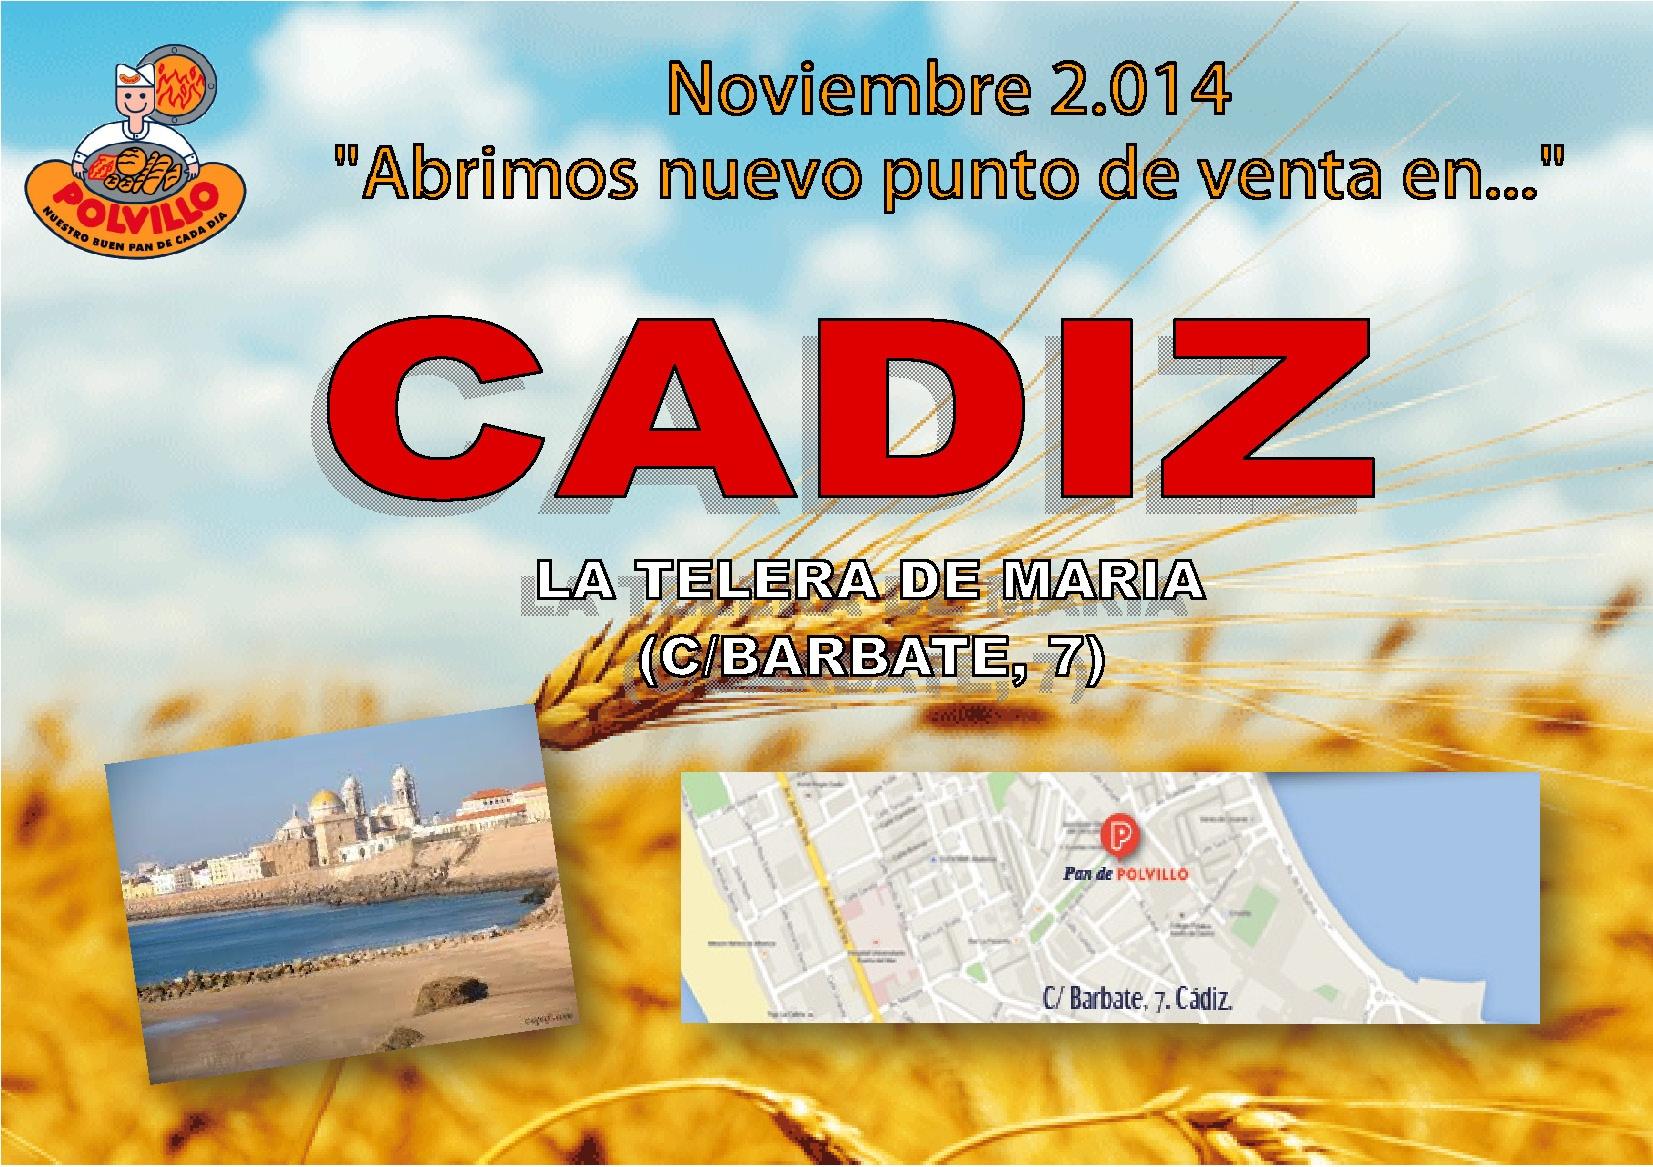 Apertura Cádiz, calle barbate